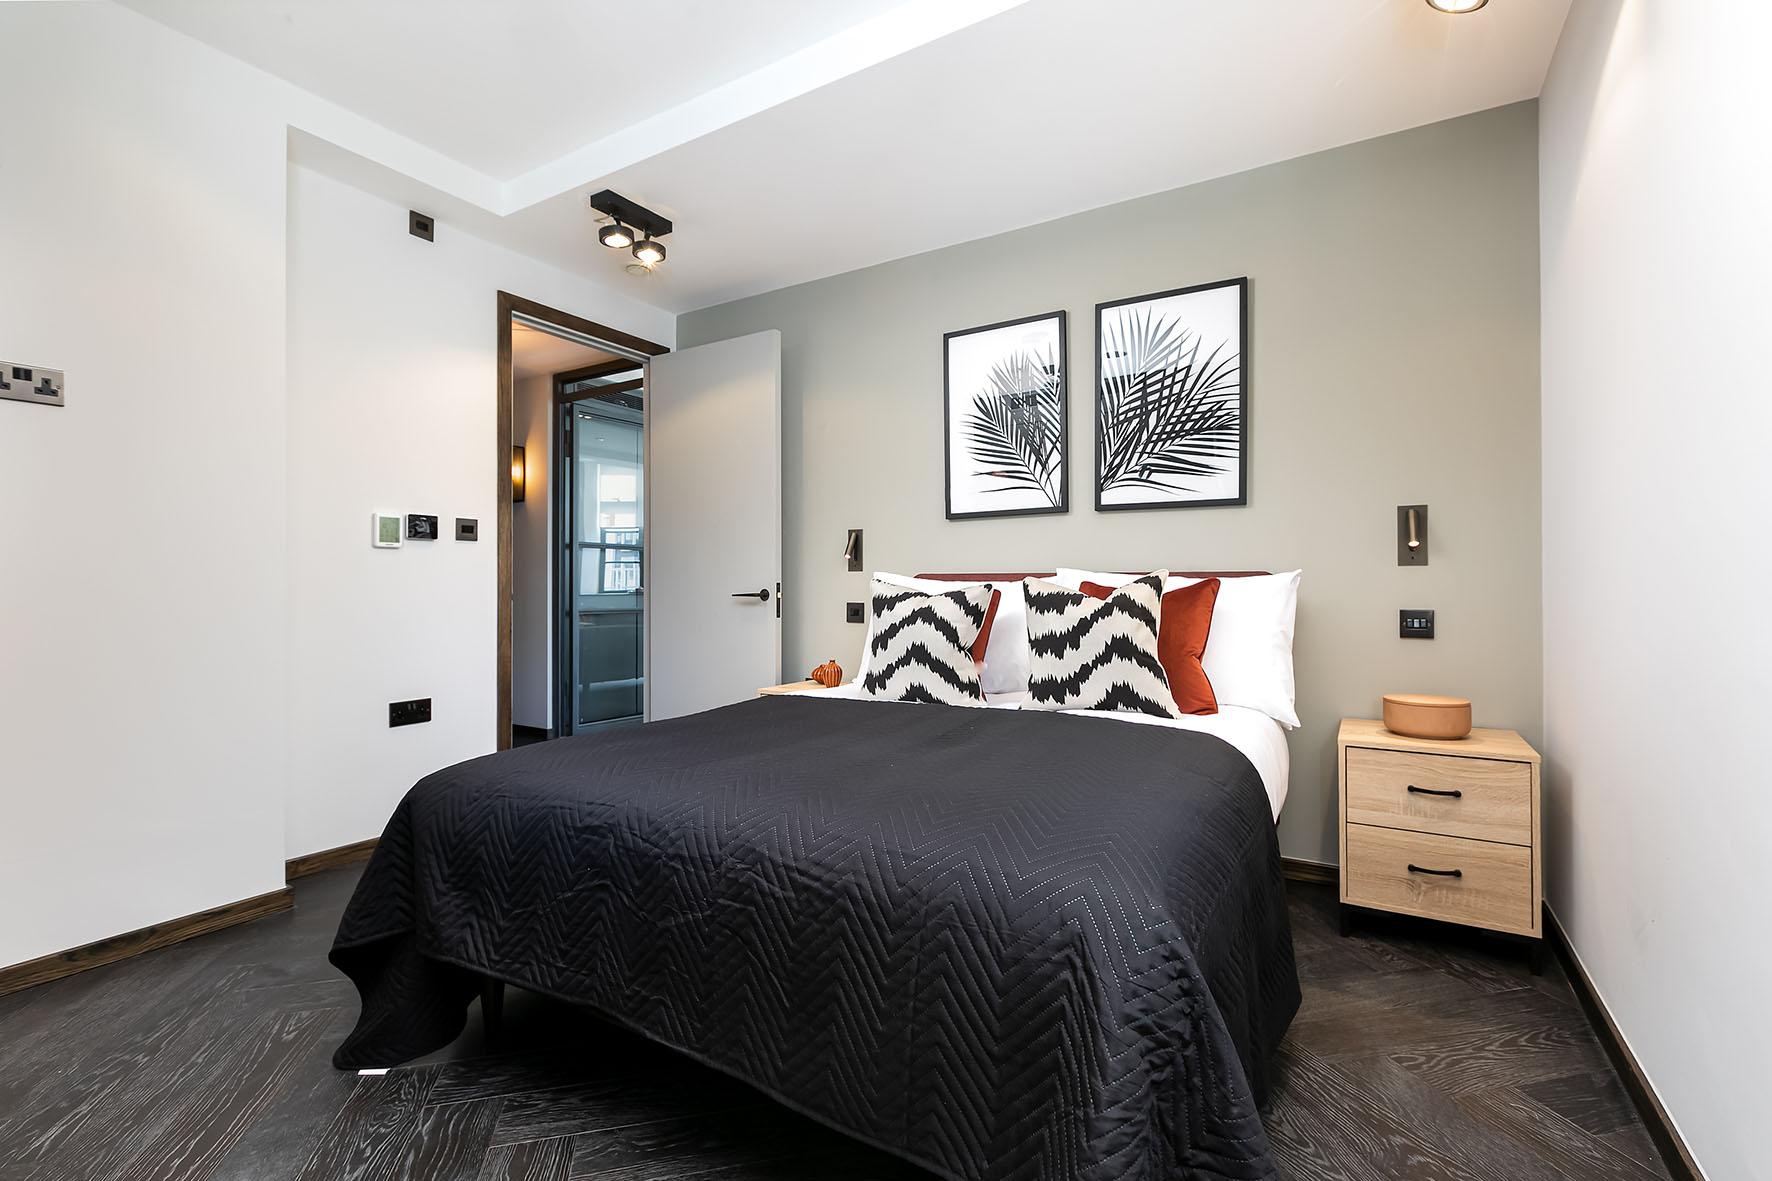 Lovelydays luxury service apartment rental - London - Soho - Oxford Street IV - Lovelysuite - 2 bedrooms - 2 bathrooms - Queen bed - b8bd36a8142d - Lovelydays